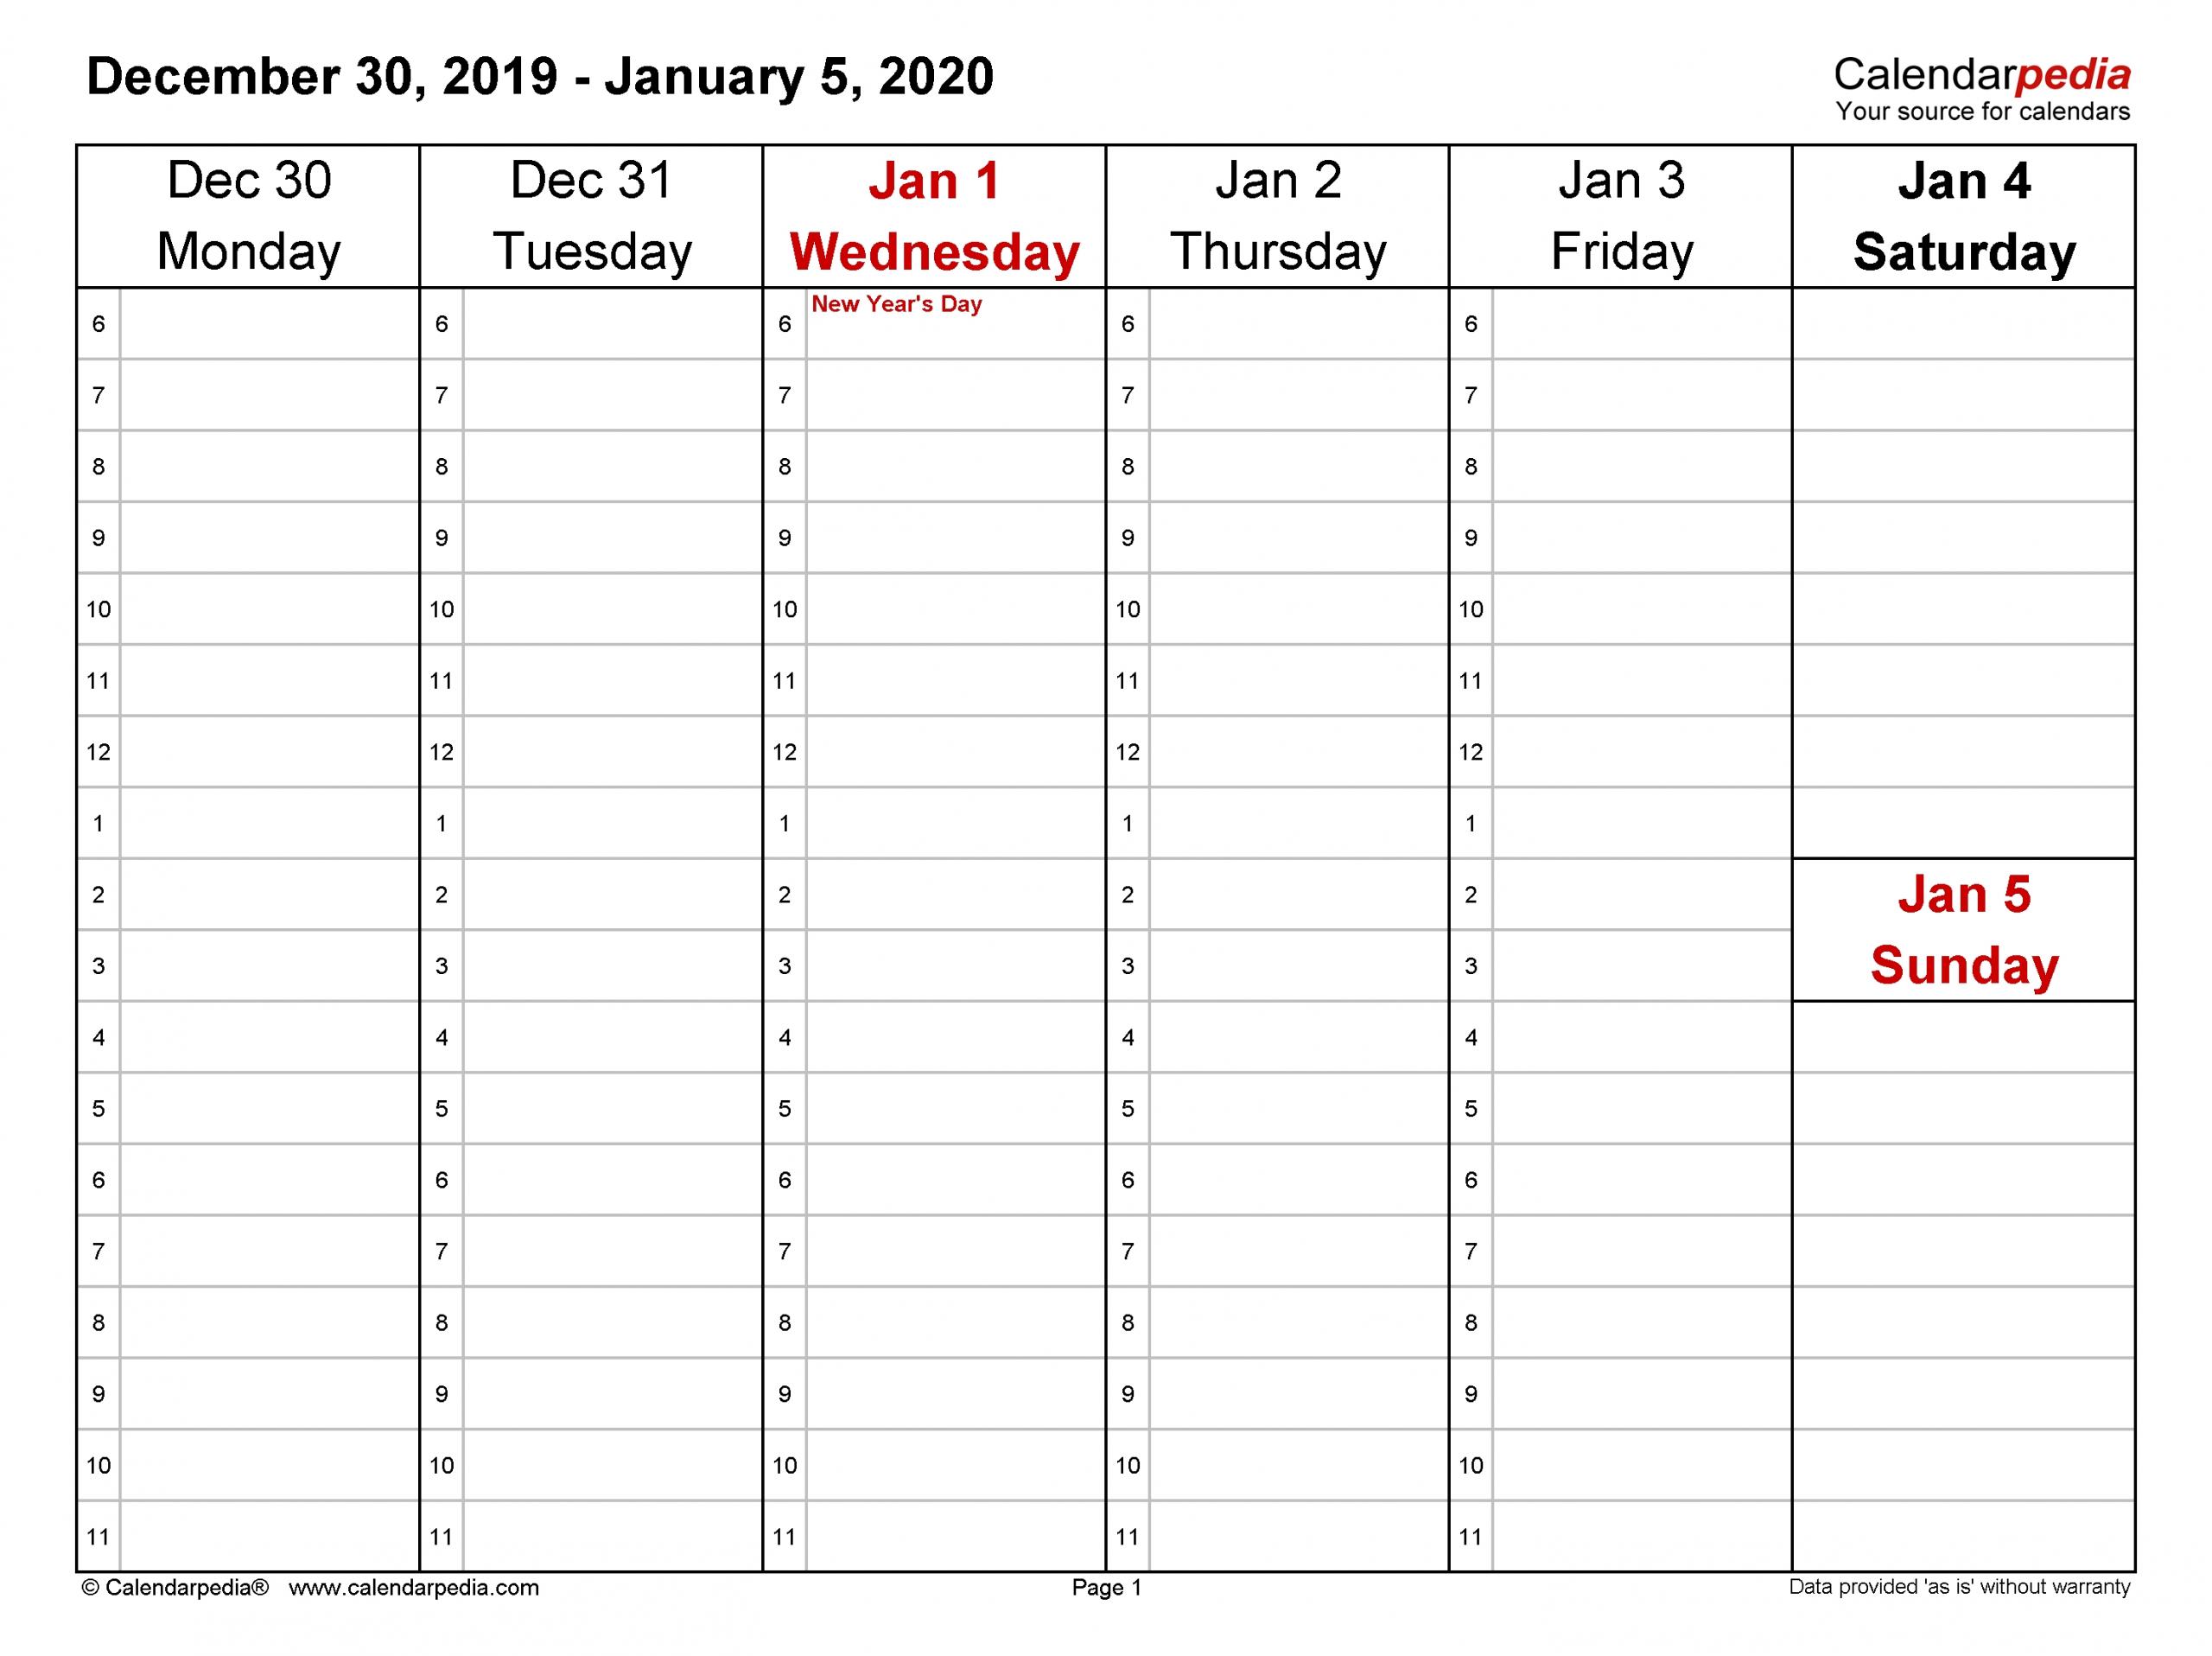 Weekly Calendars 2020 For Pdf - 12 Free Printable Templates pertaining to Calendar 2020 Week Wise In Window